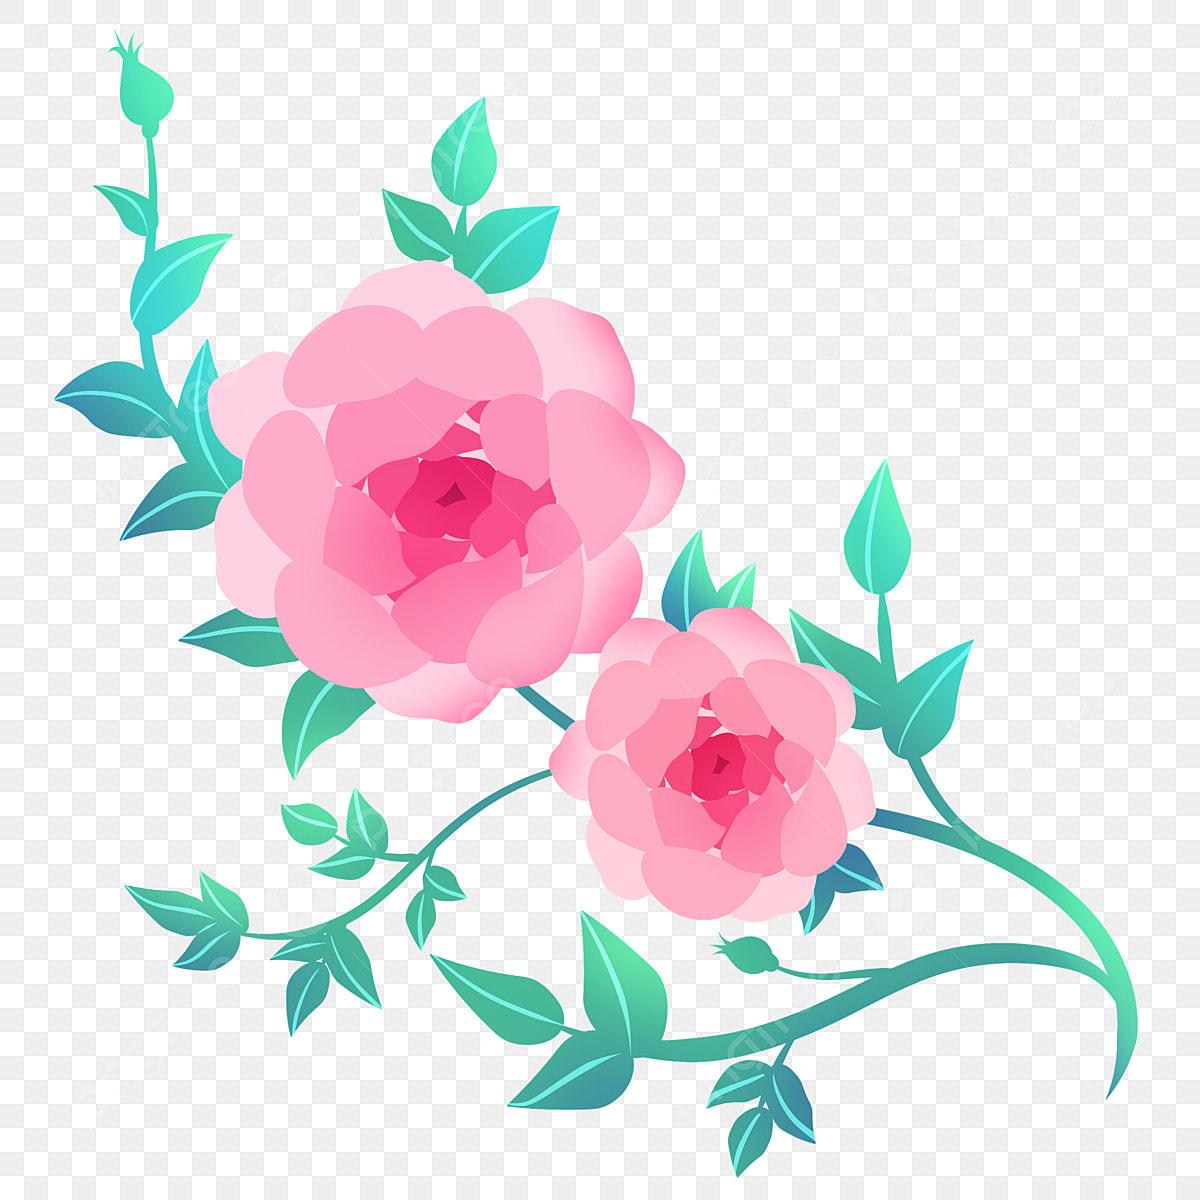 Pink Flower Flower Vine Illustration, Pink Flowers, Flowers